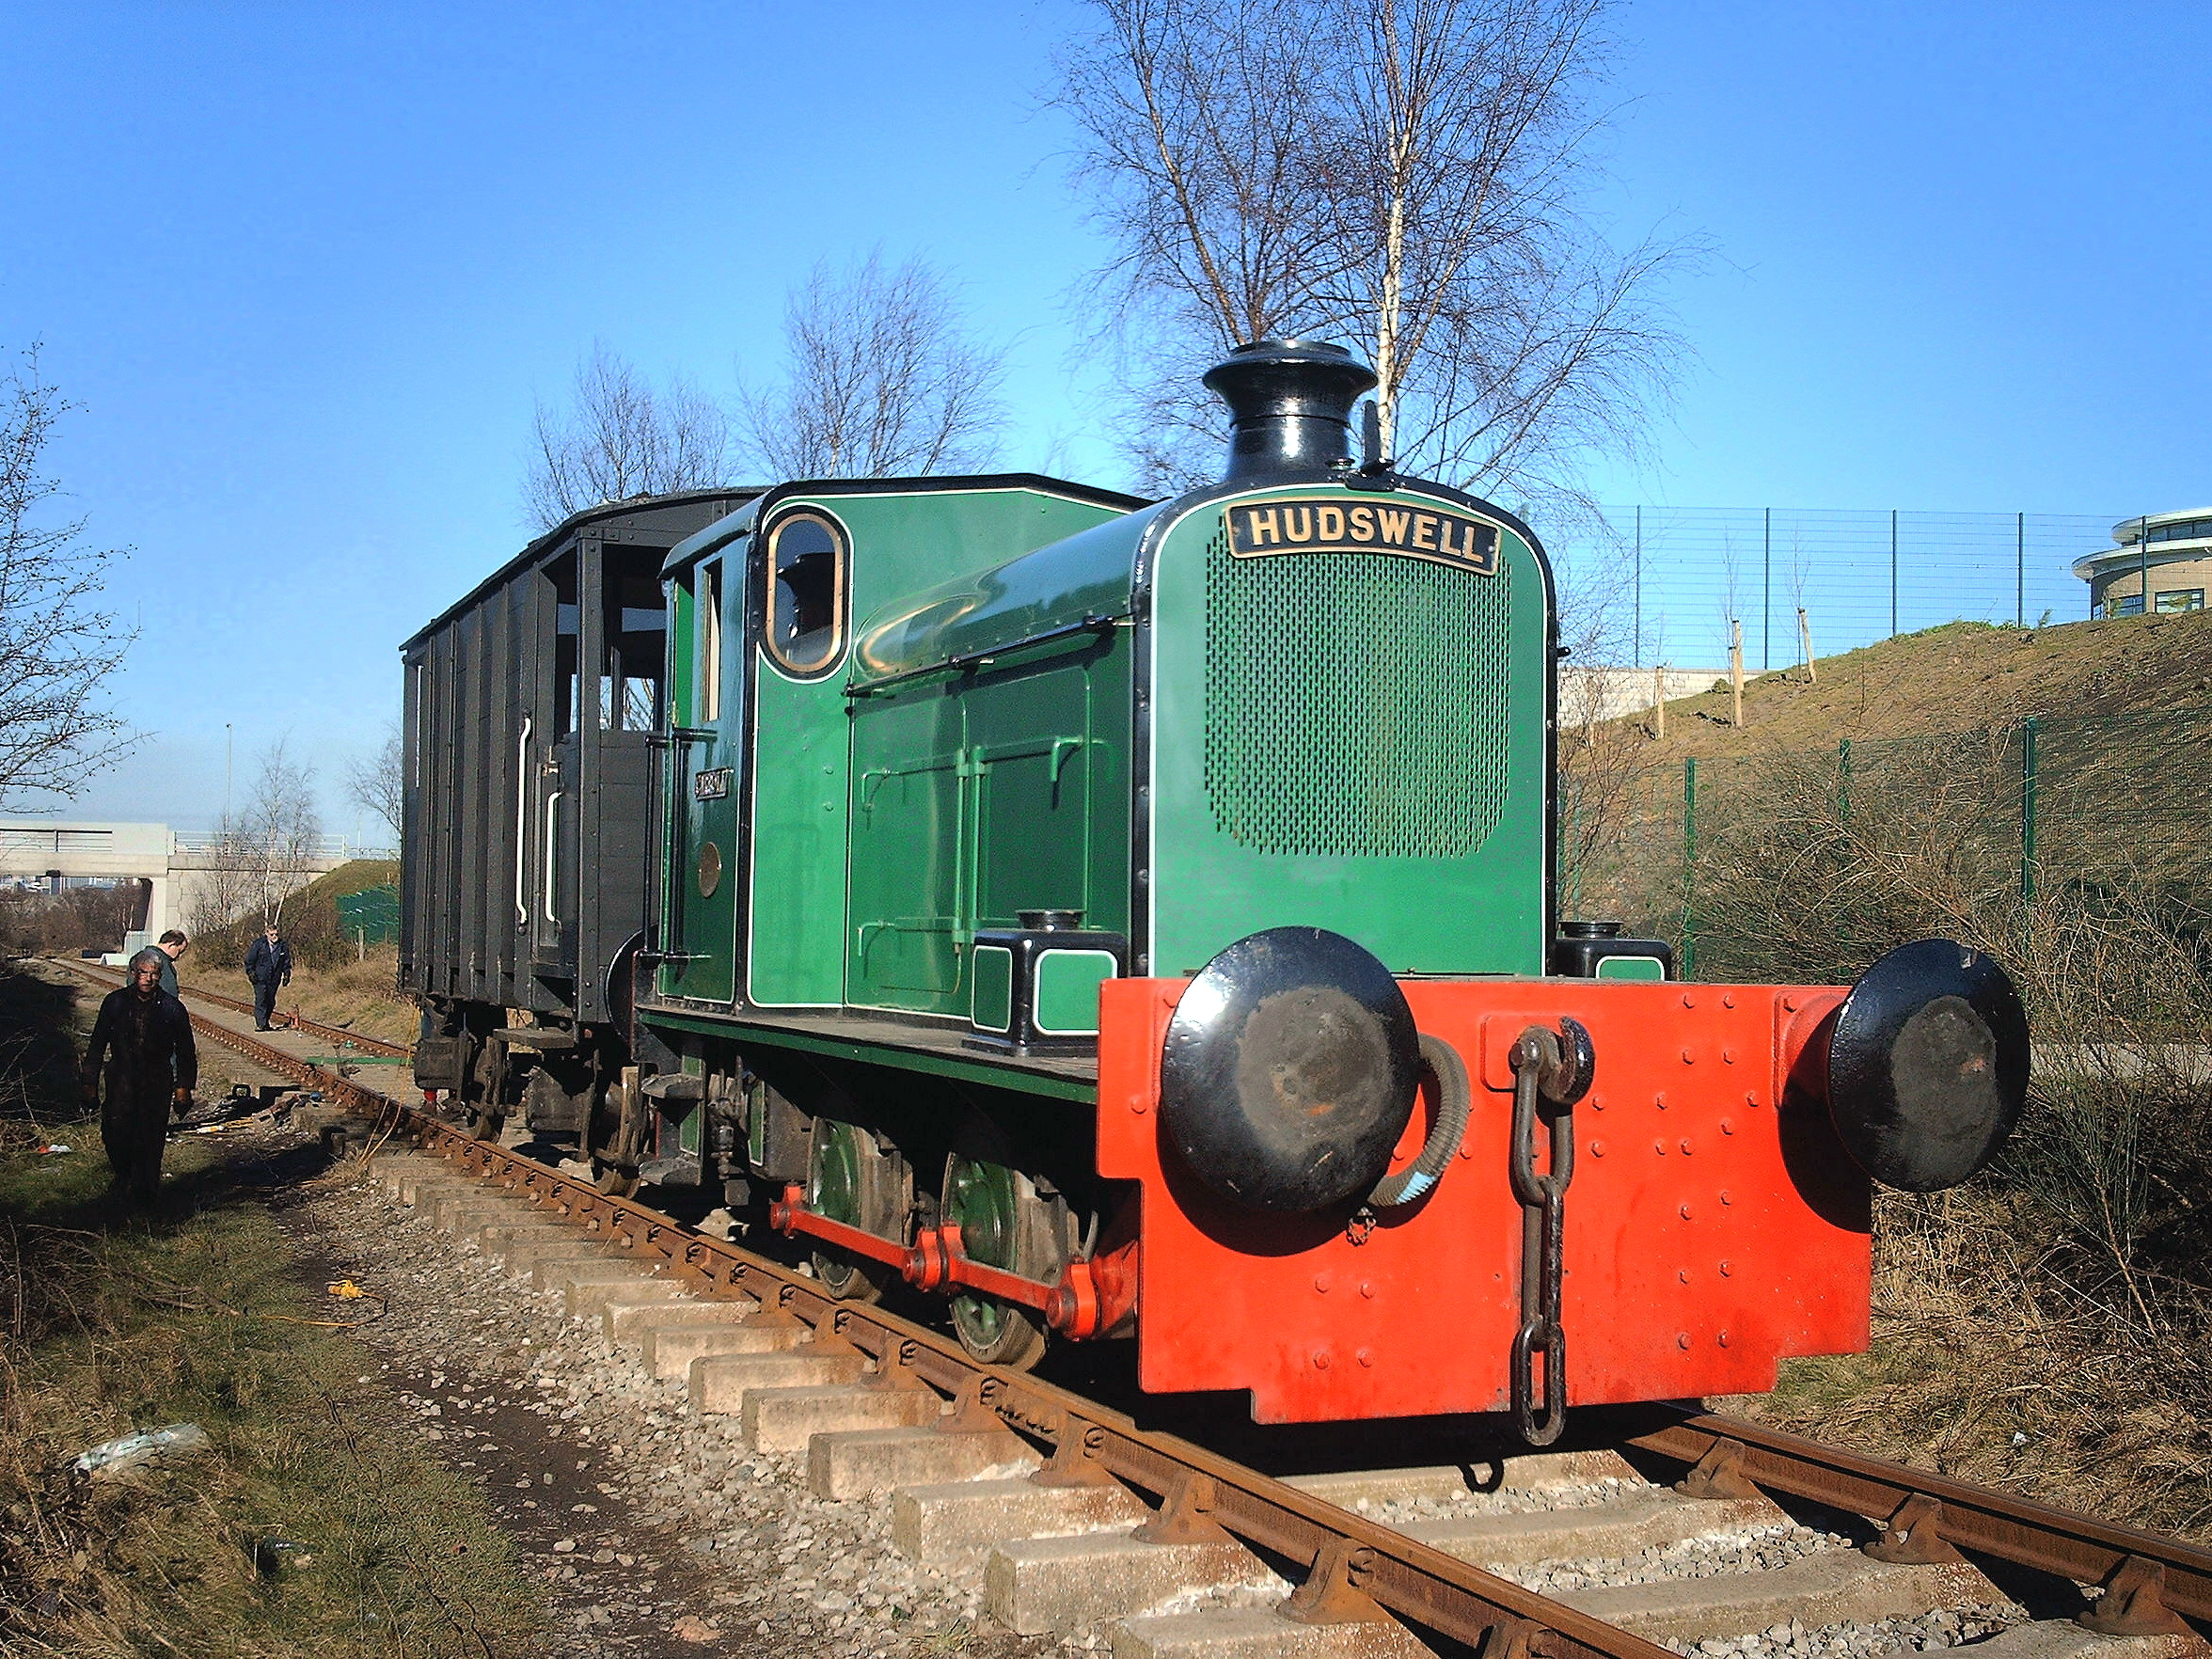 Middleton Railway Tractor Construction Plant Wiki Fandom